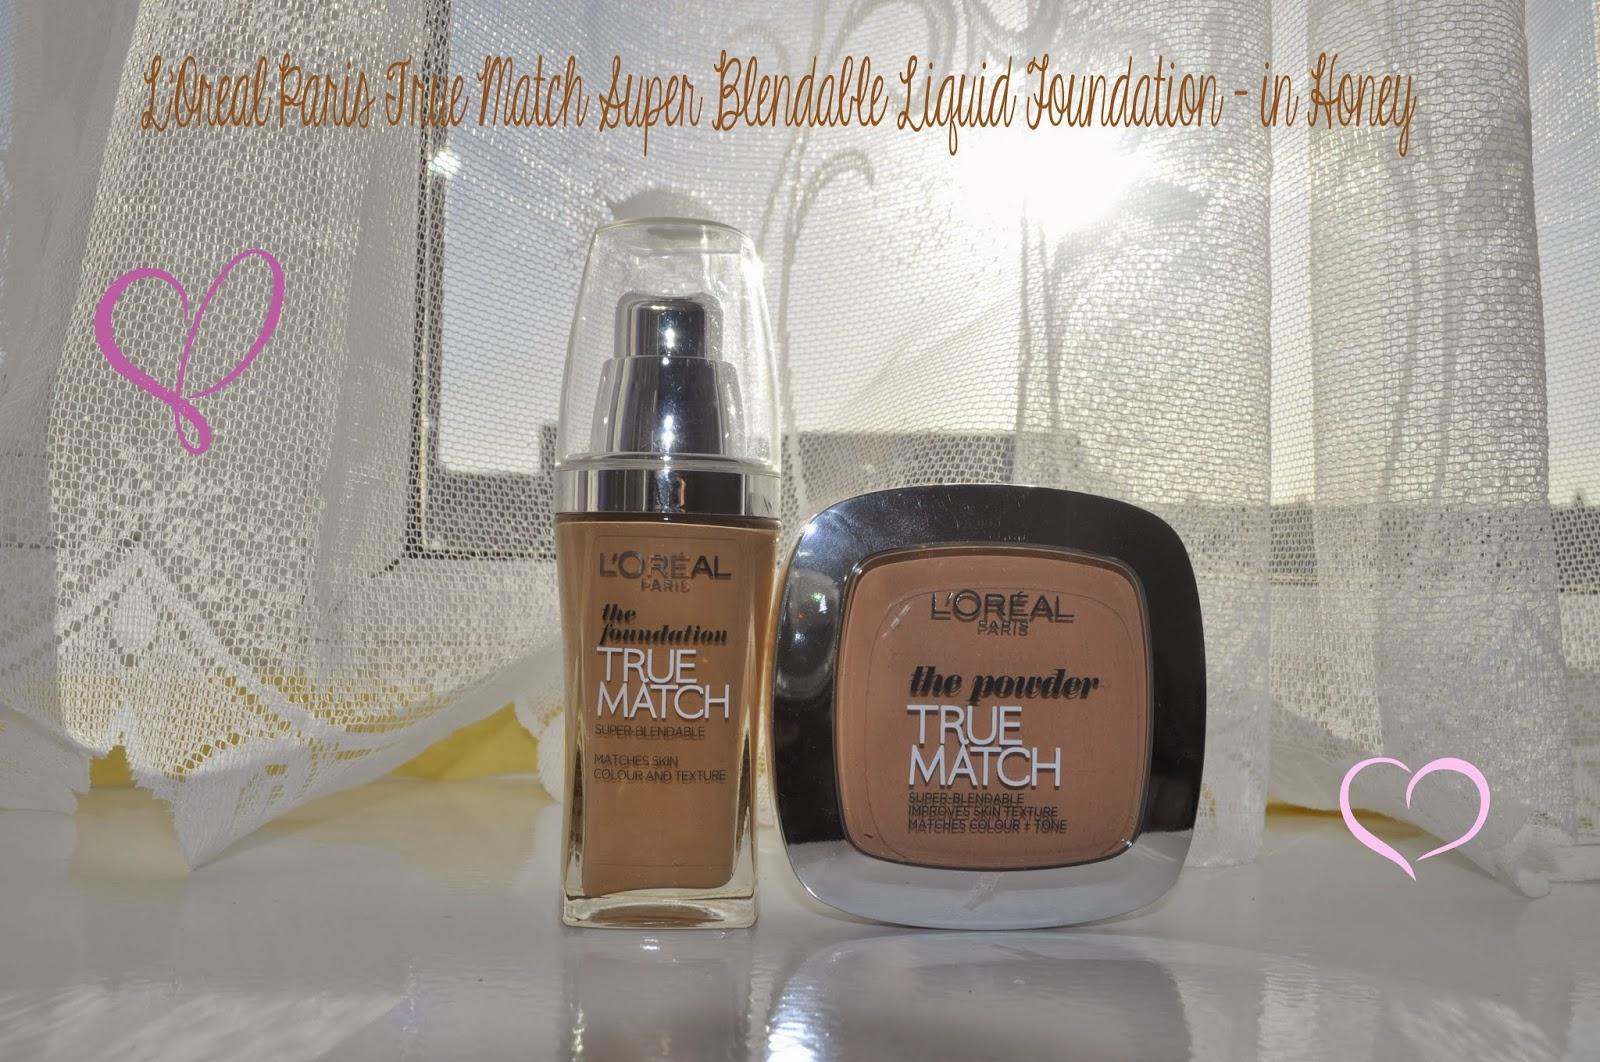 L'Oreal True Match Super Blendable Liquid Foundation - Honey (N6) REVIEW. Wednesday, 18 December 2013